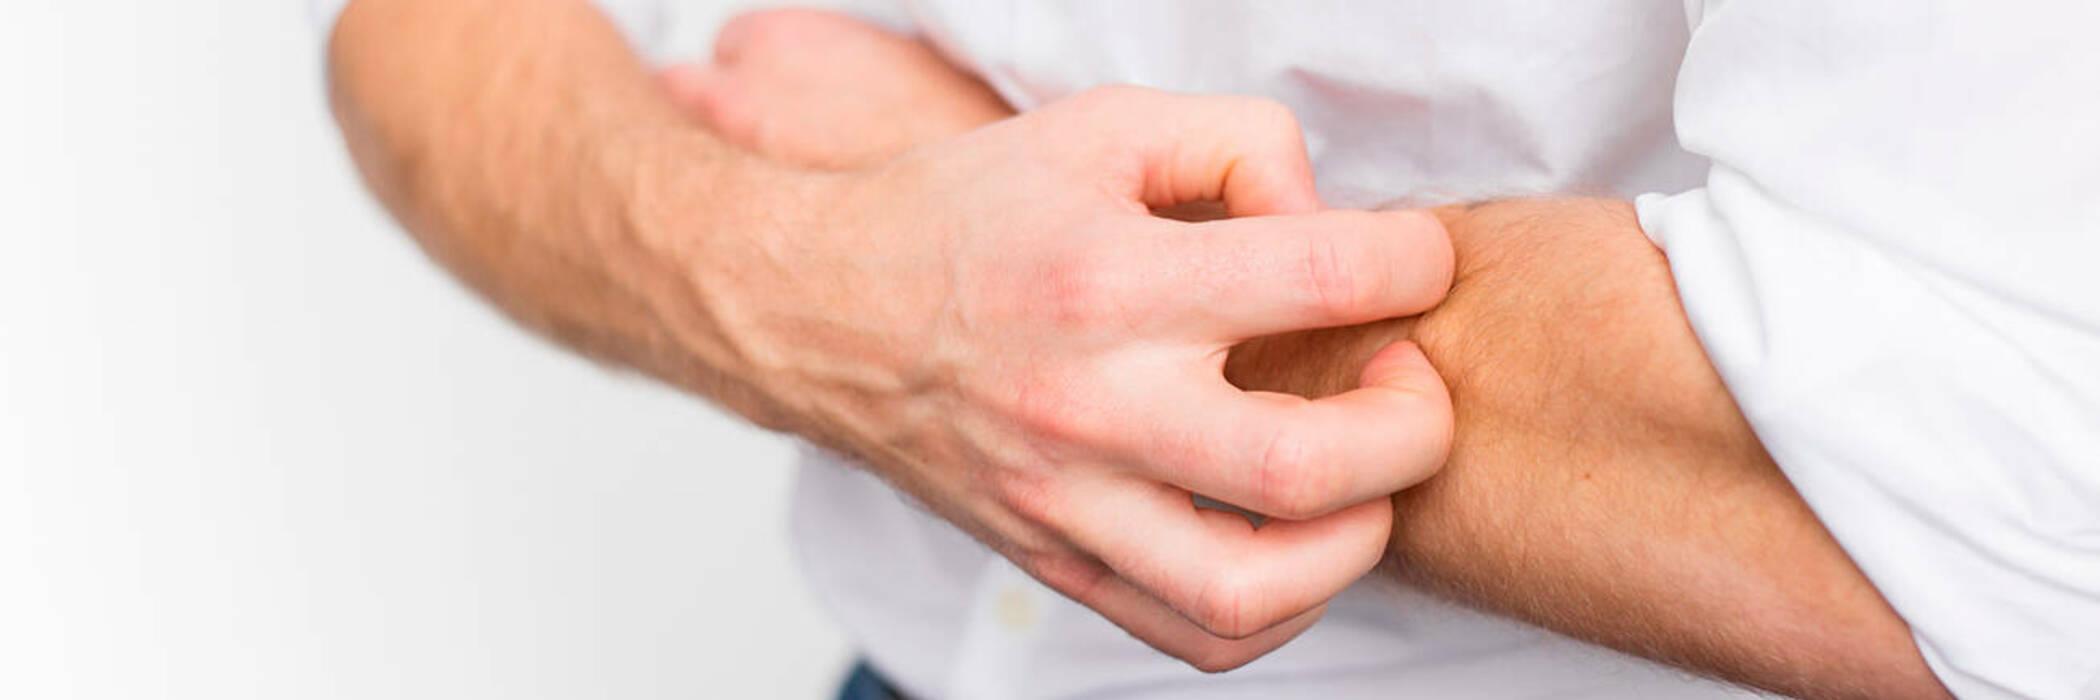 16nov antibiotics for your skin